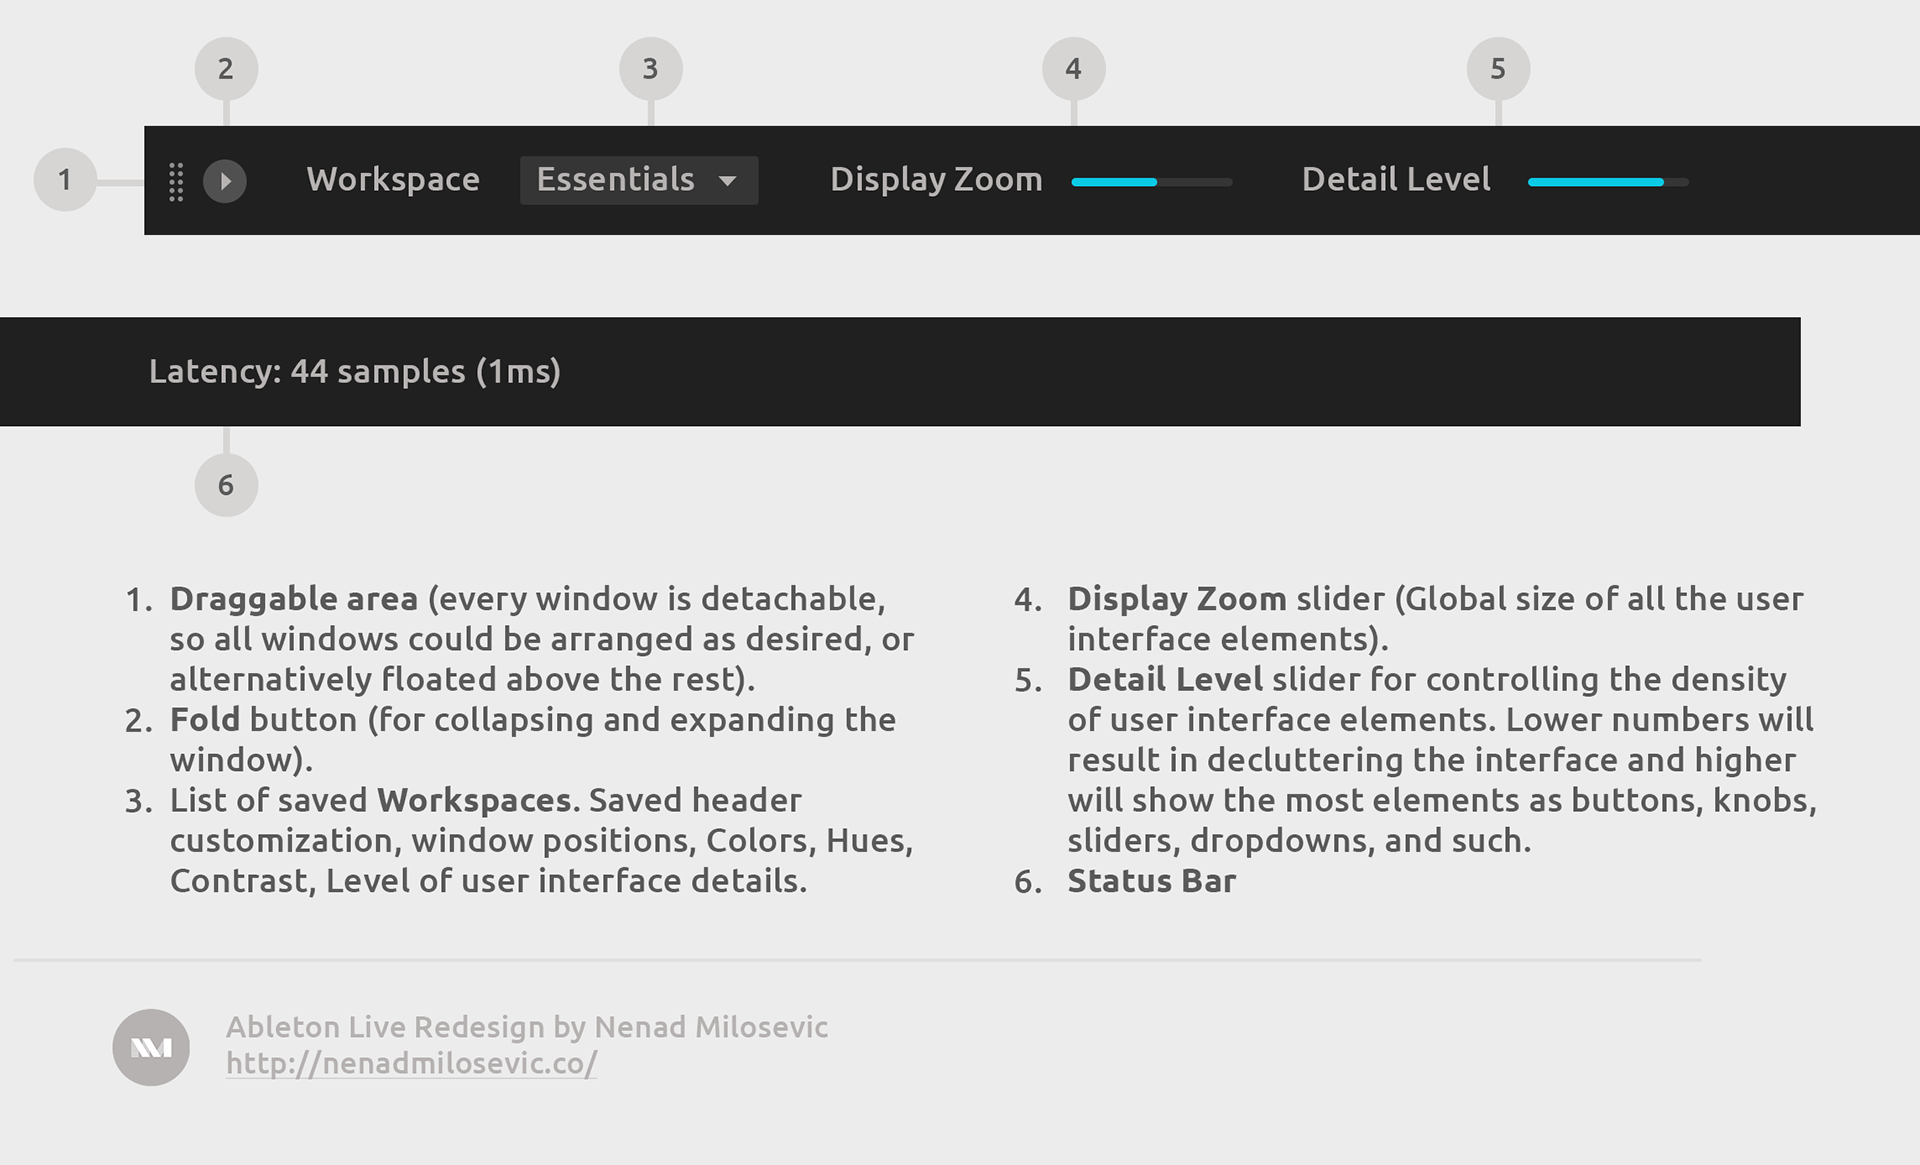 Ableton Live Redesign on Behance